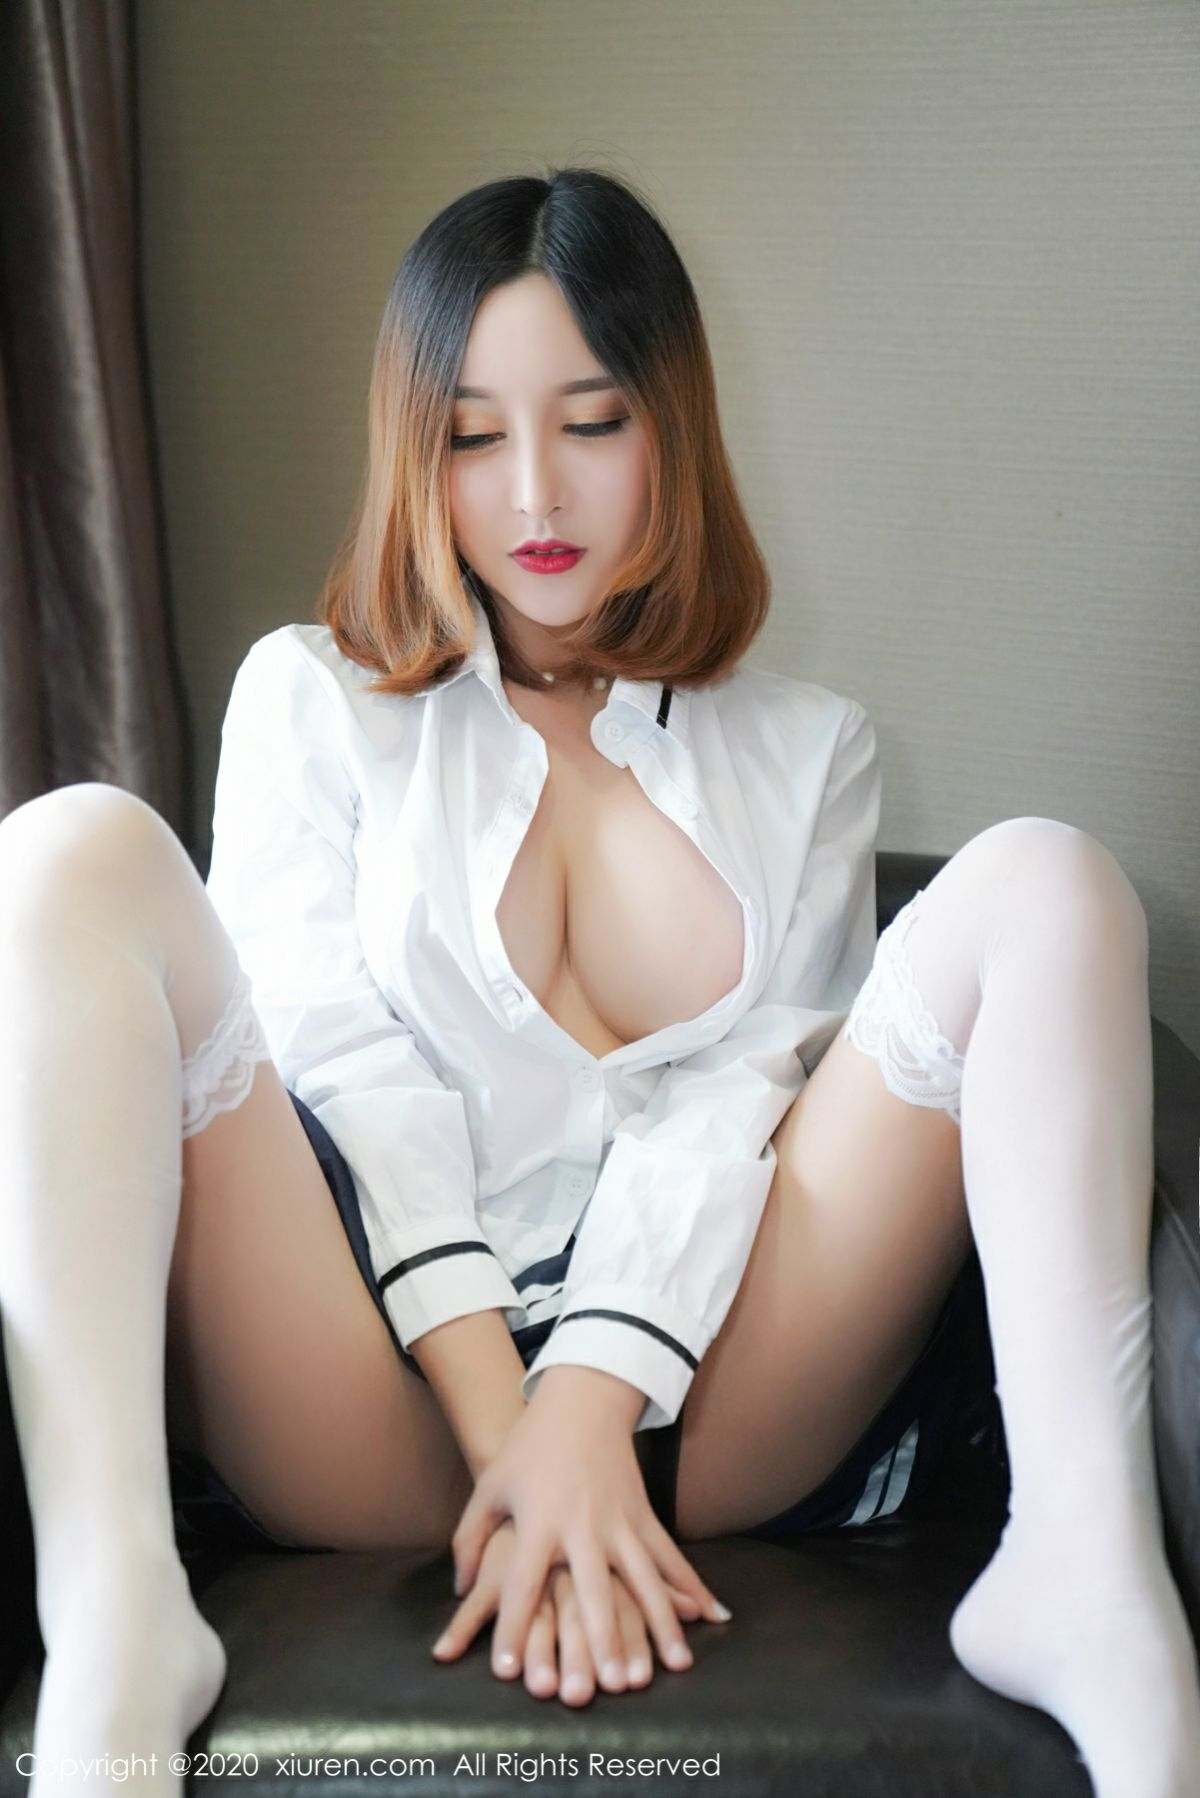 [XiuRen秀人网]2020.02.27 No.2010 李梓熙-第3张图片-福利社